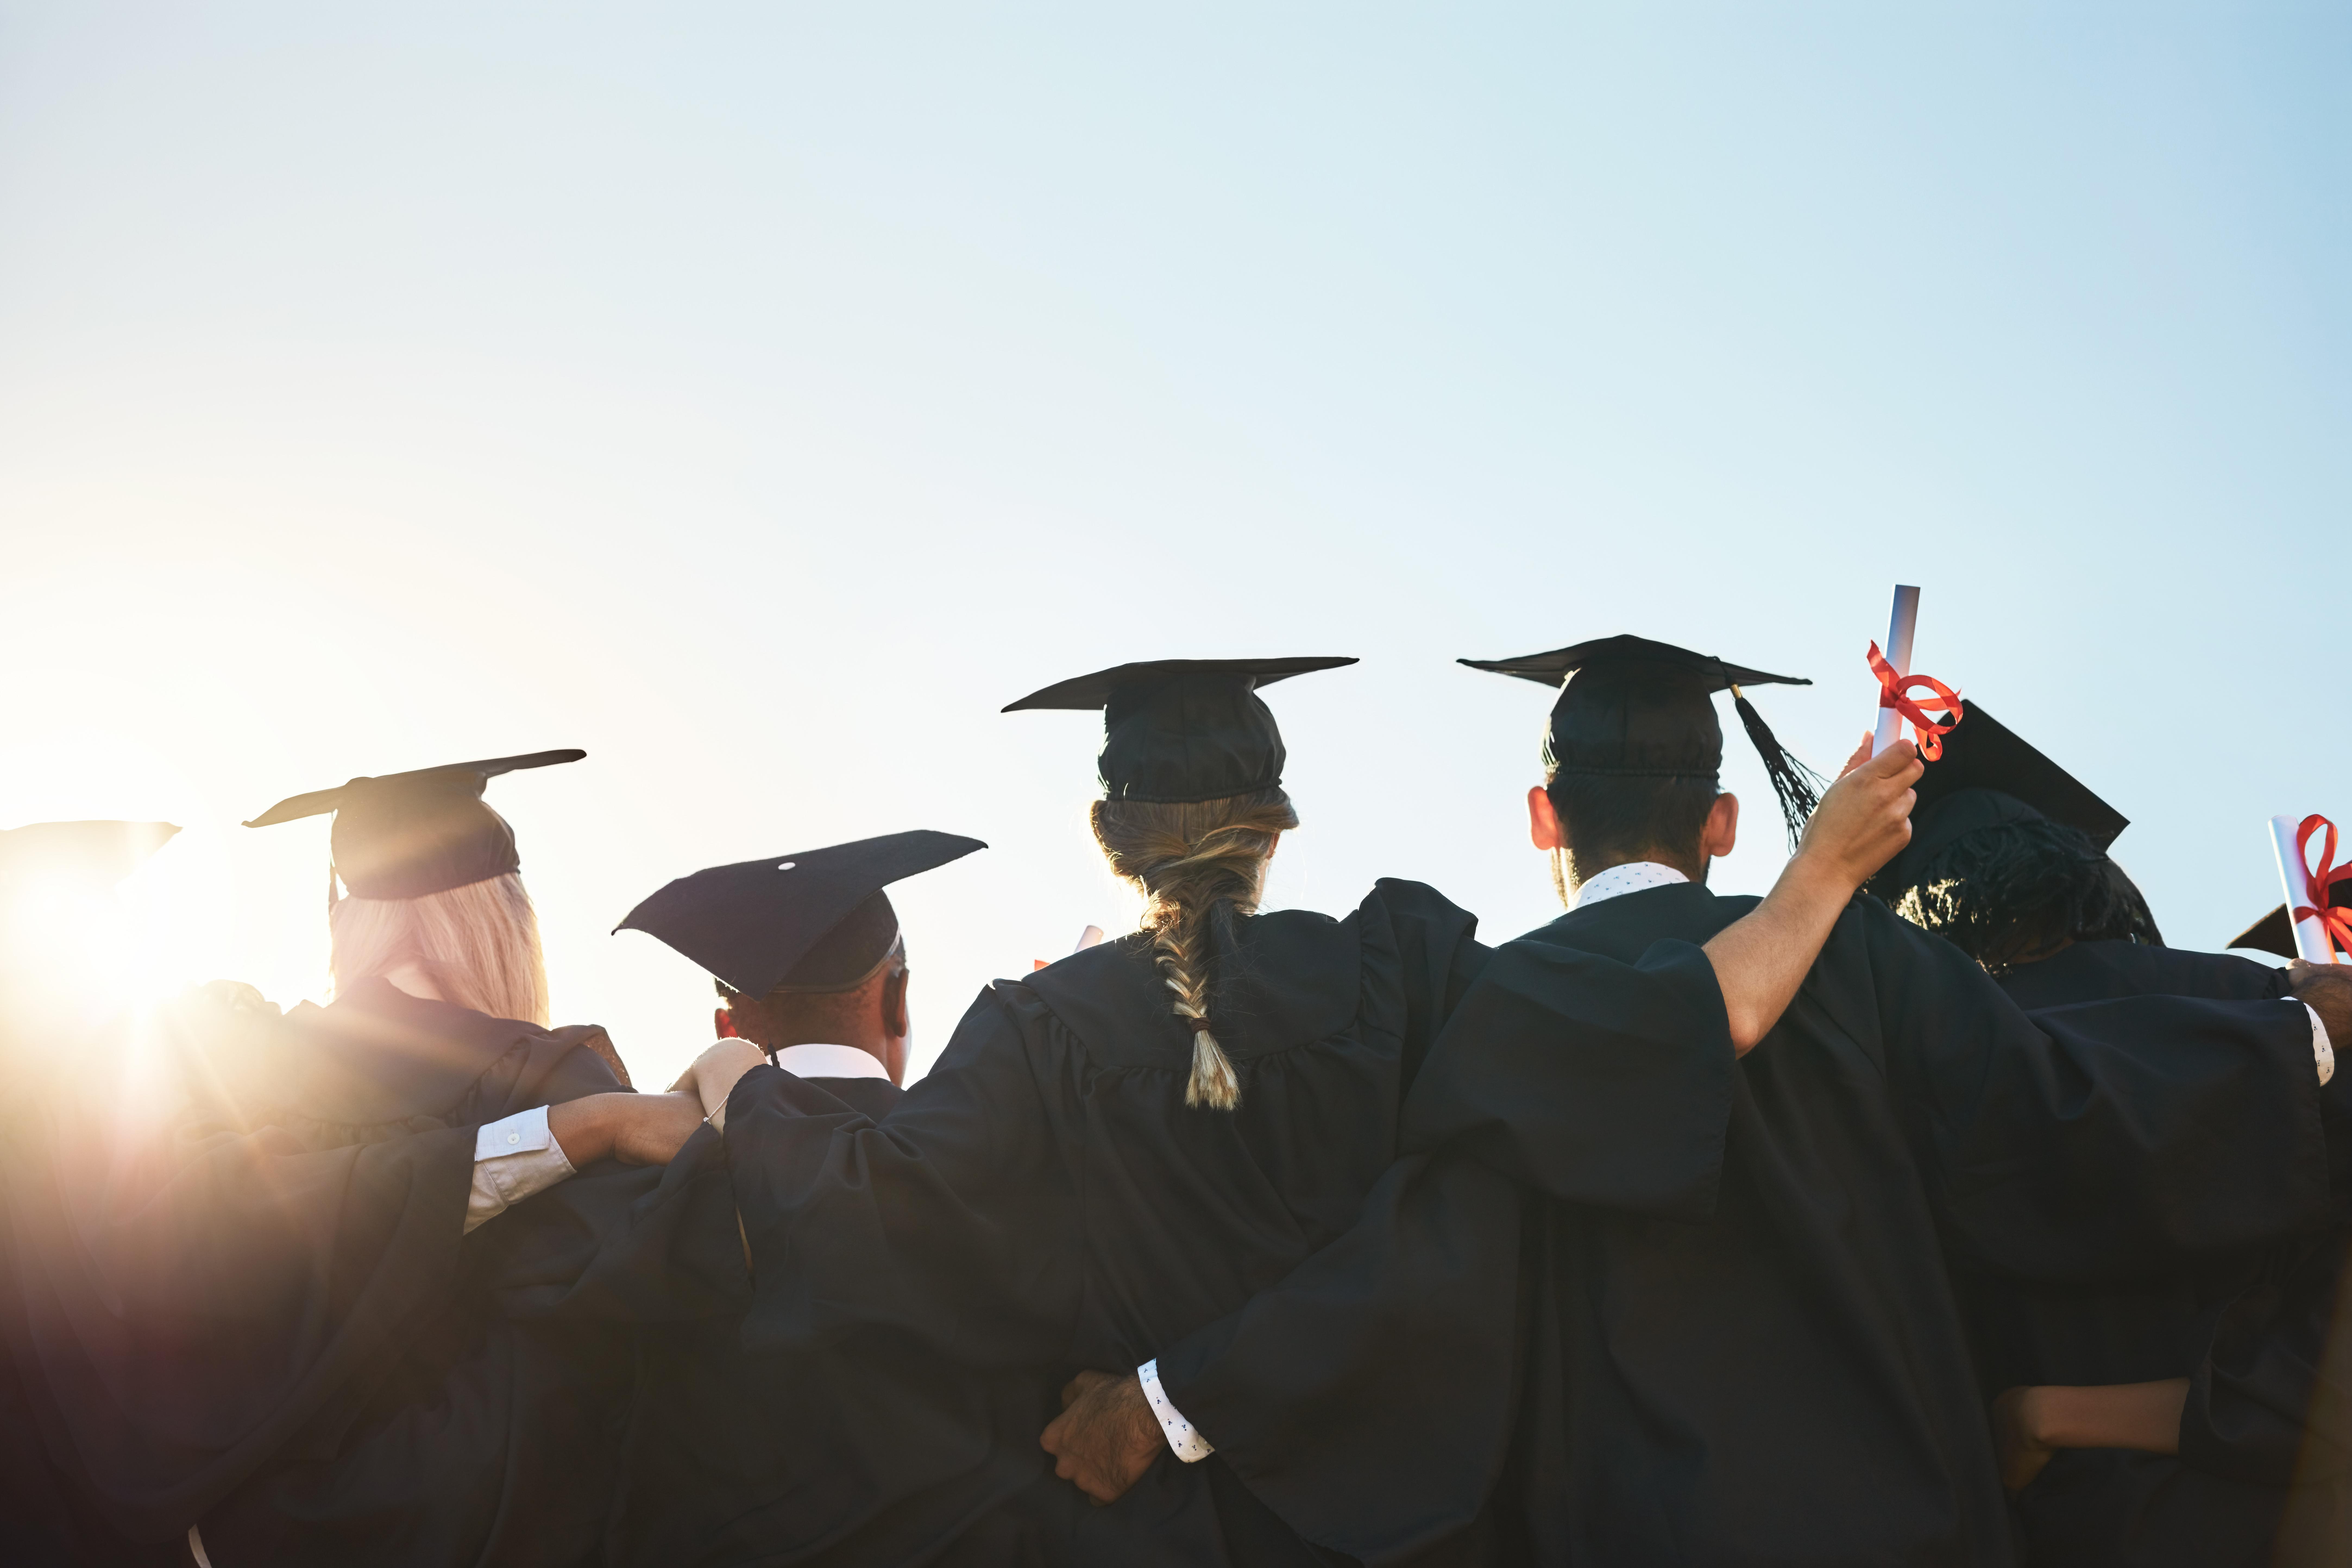 How to Wear Graduation Regalia, Stole & Cord | The Classroom